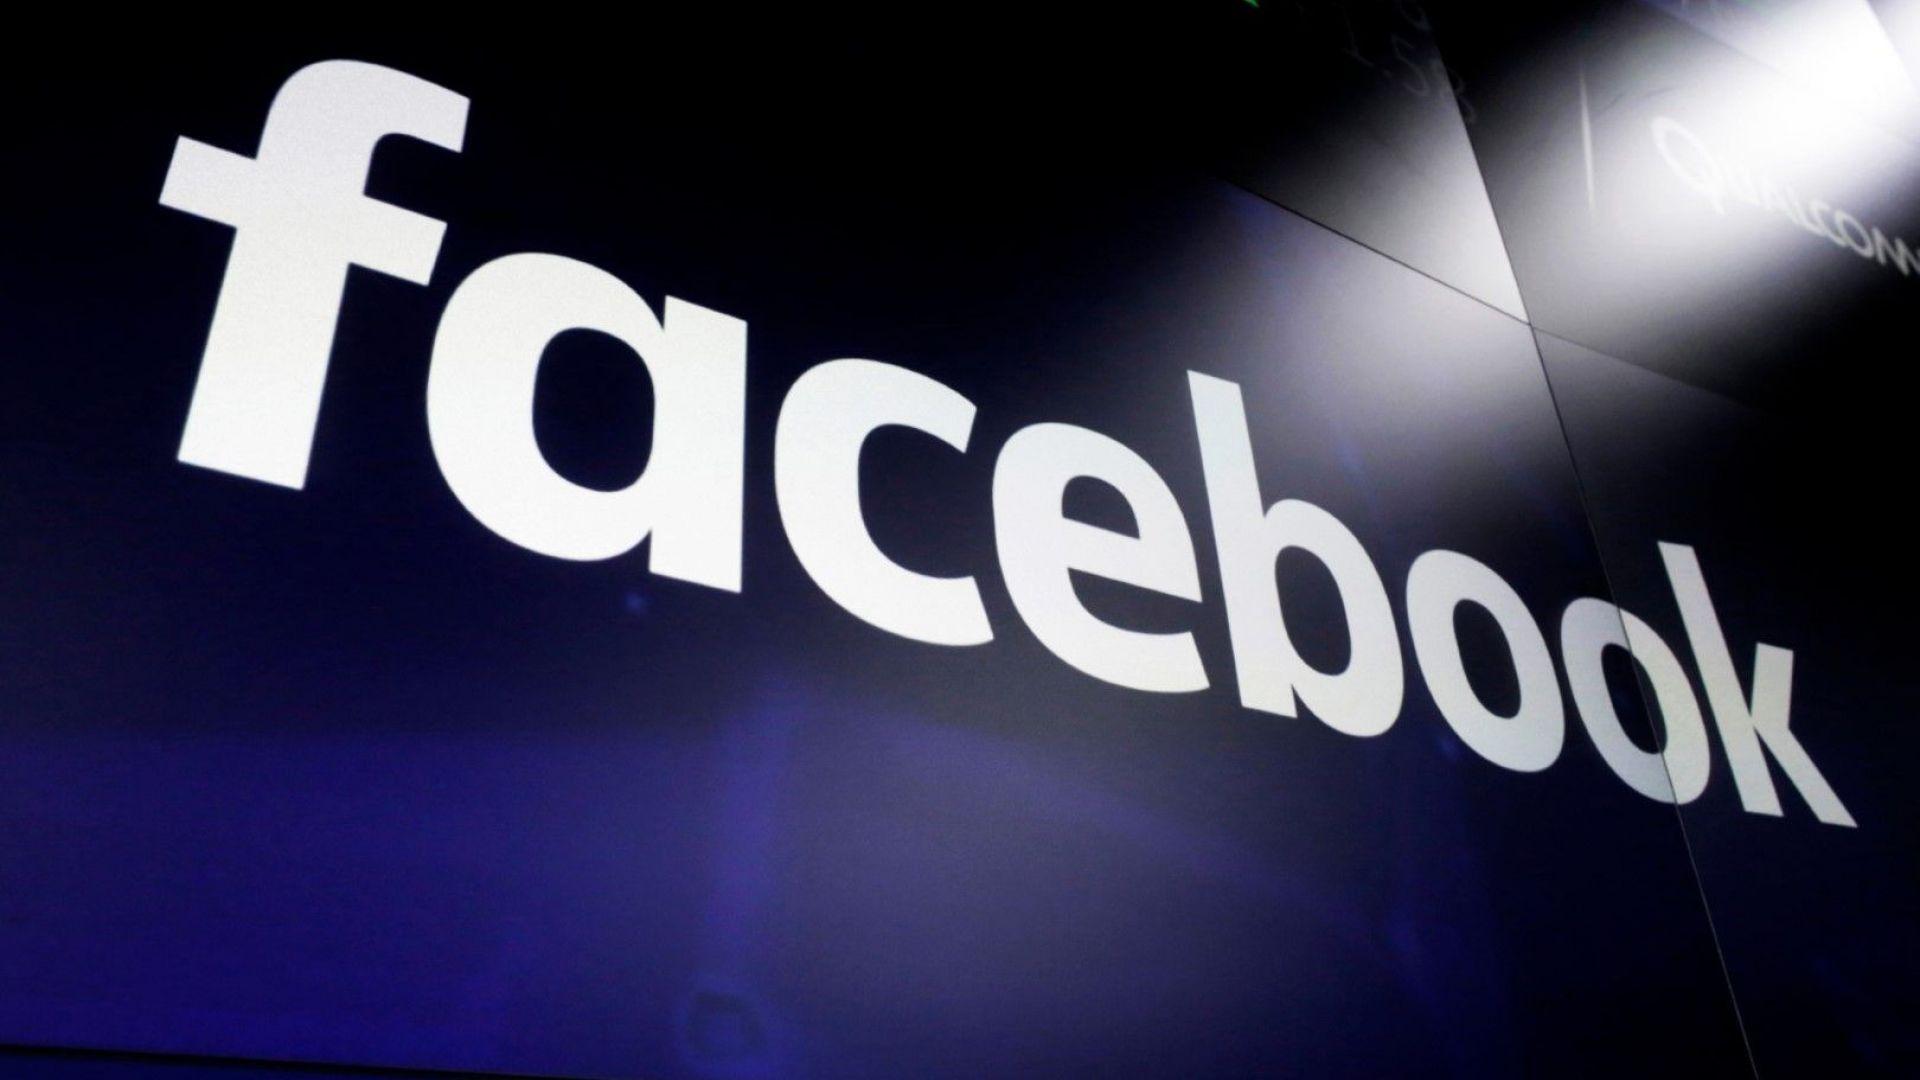 Фейсбук премахва фалшиви акаунти преди евроизборите